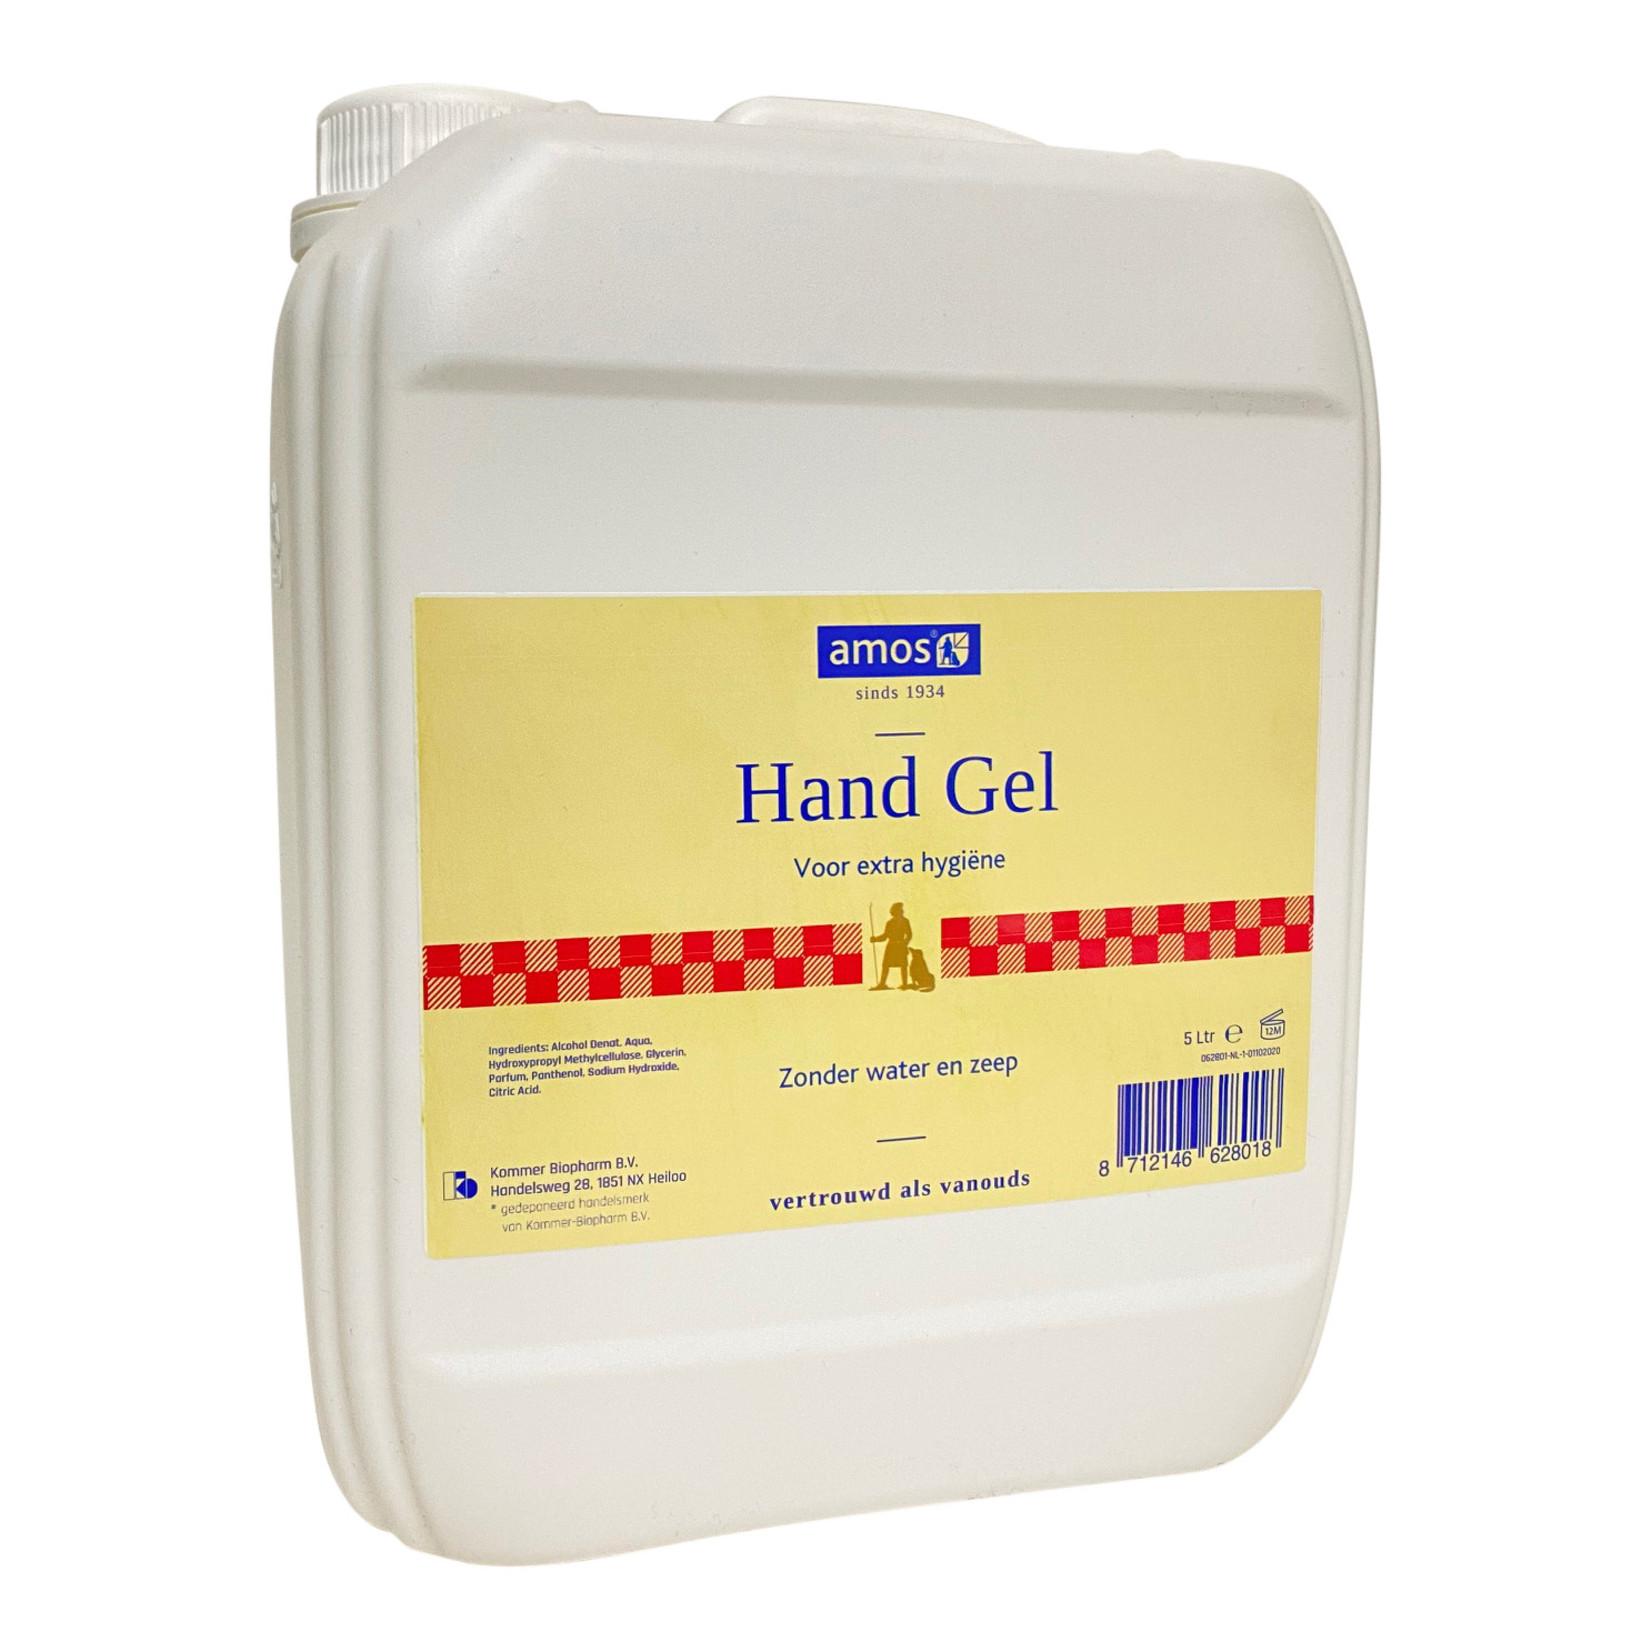 Amos handgel 5 liter voor extra hygiëne